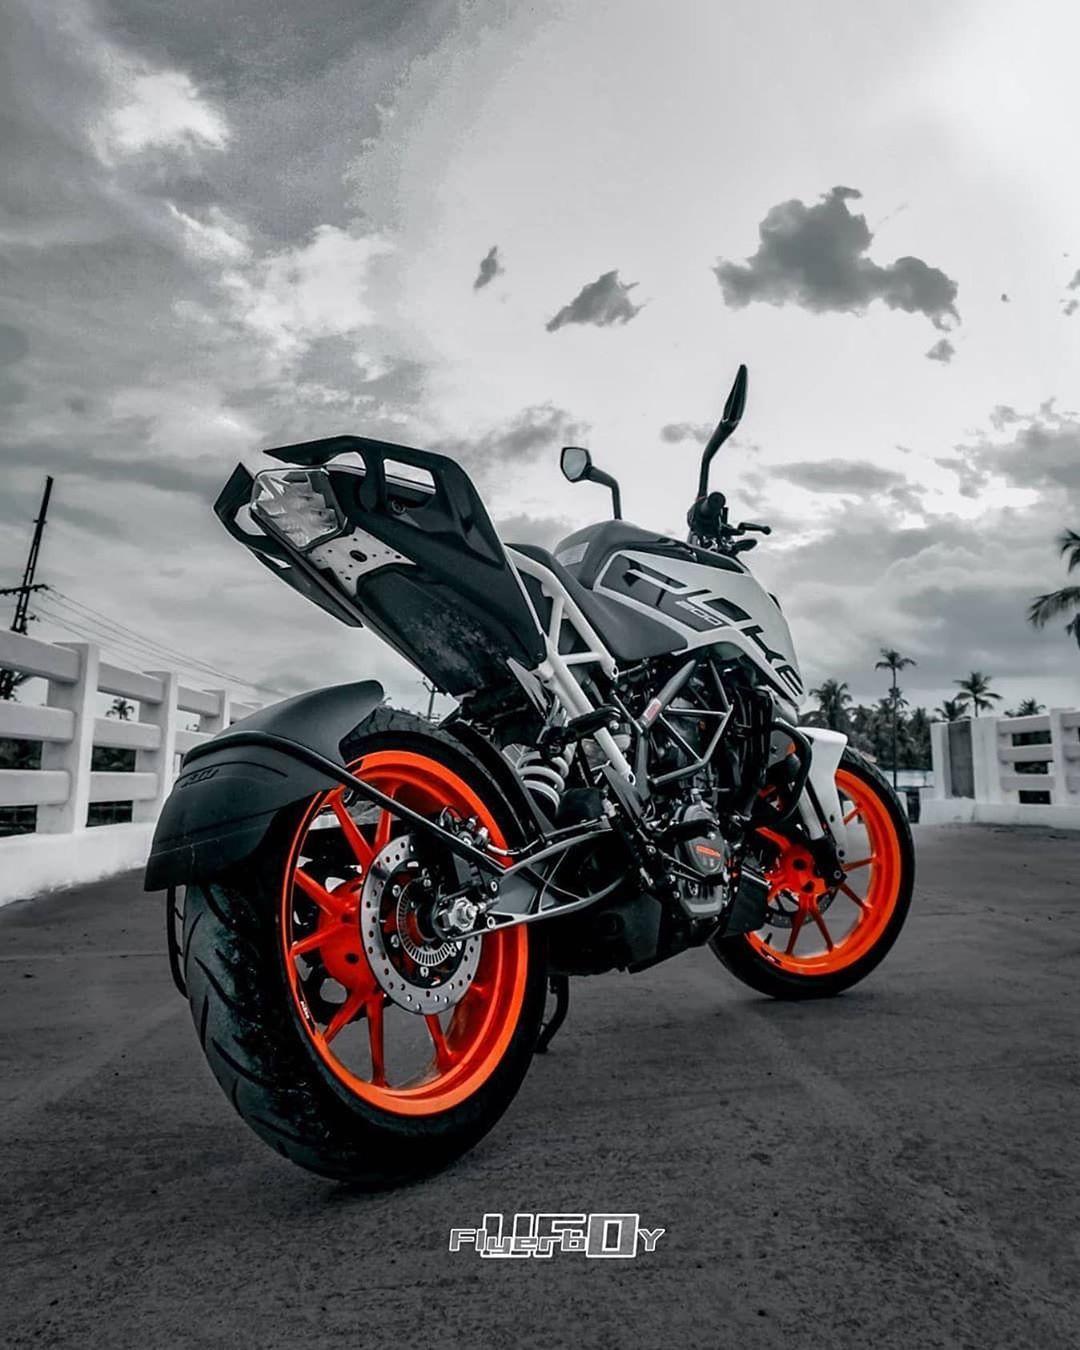 2 439 Likes 5 Comments Ktm Duke Ofcl On Instagram Do Follow Ktm Duke Ofcl Ktm Duke Ktm Duke 200 Duke Bike Download ktm rc modified wallpaper